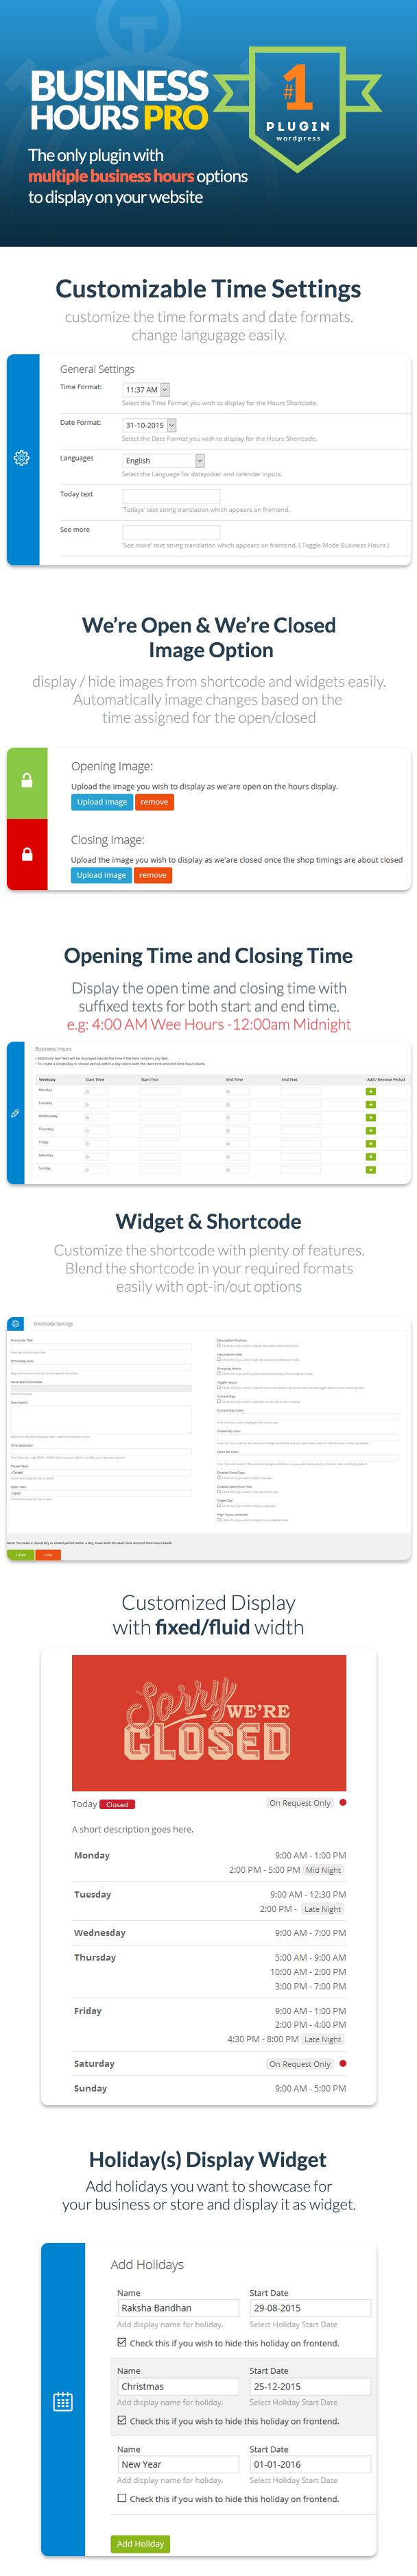 Business Hours Pro WordPress Plugin - 5